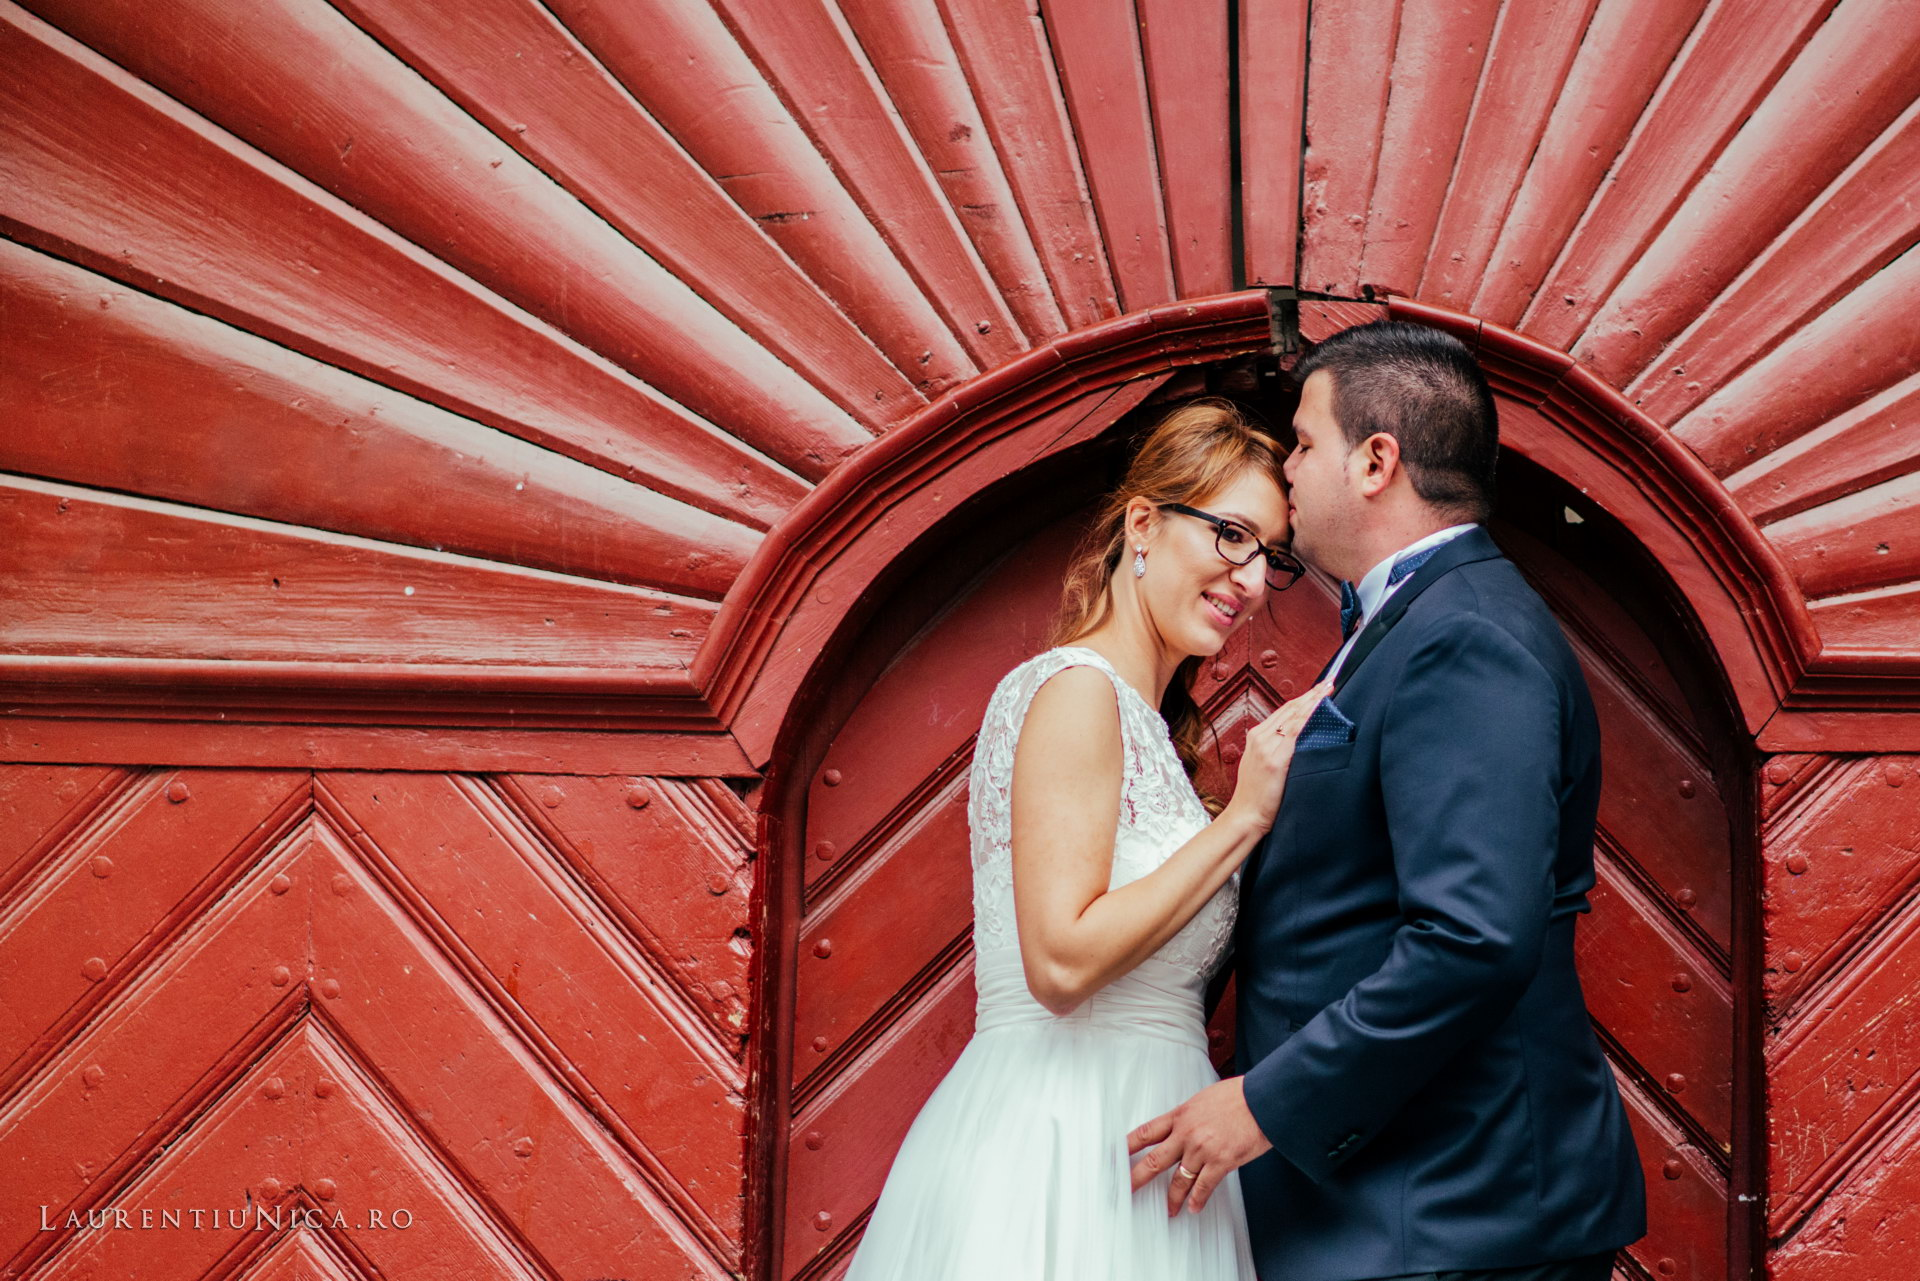 iulia-si-cosmin-fotografii-after-wedding-brasov-laurentiu-nica34